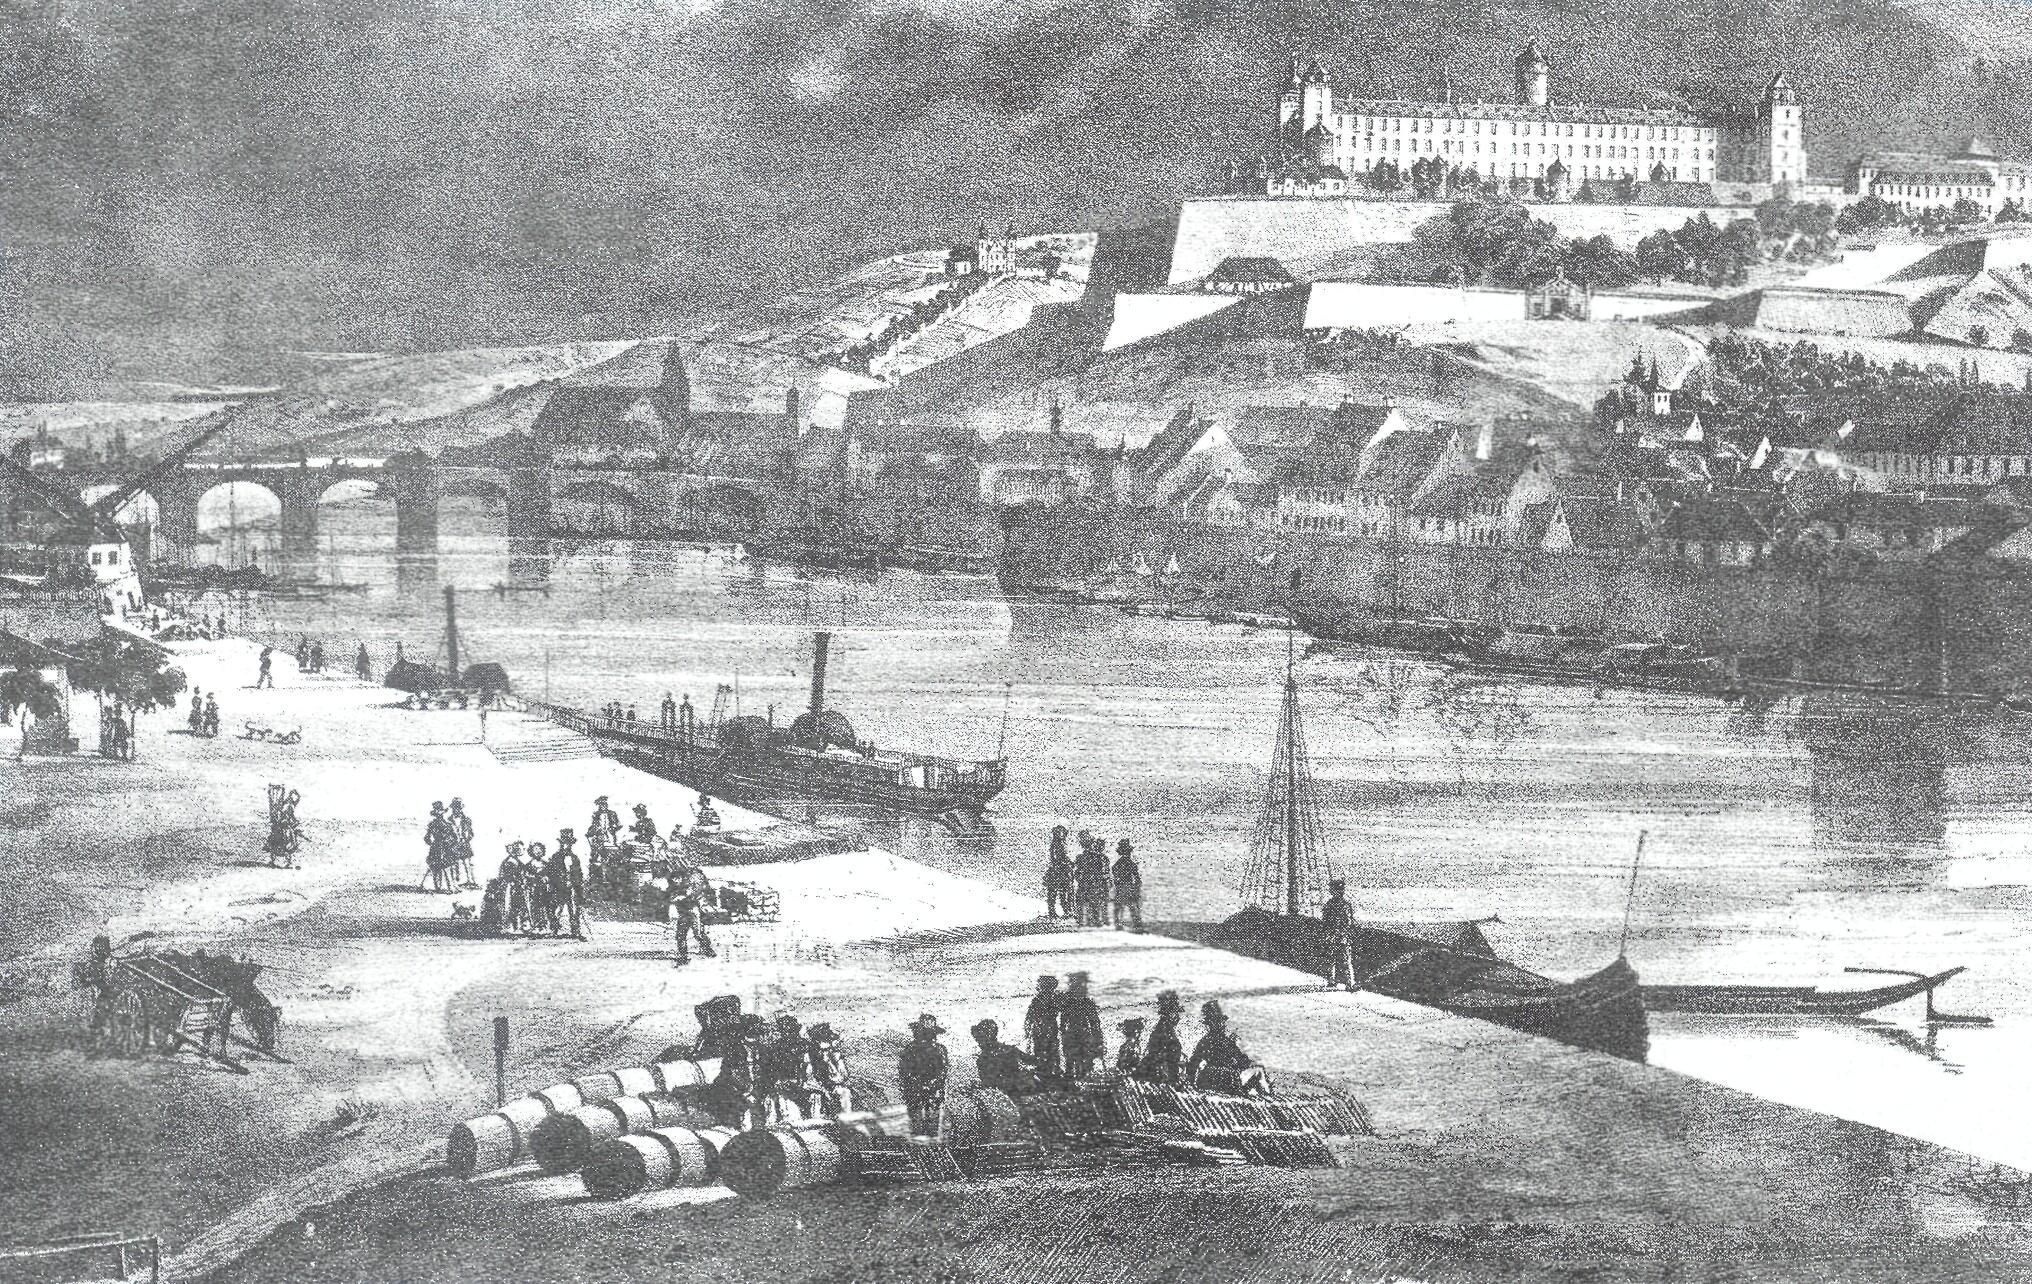 File:Würzburg, 1845.jpg